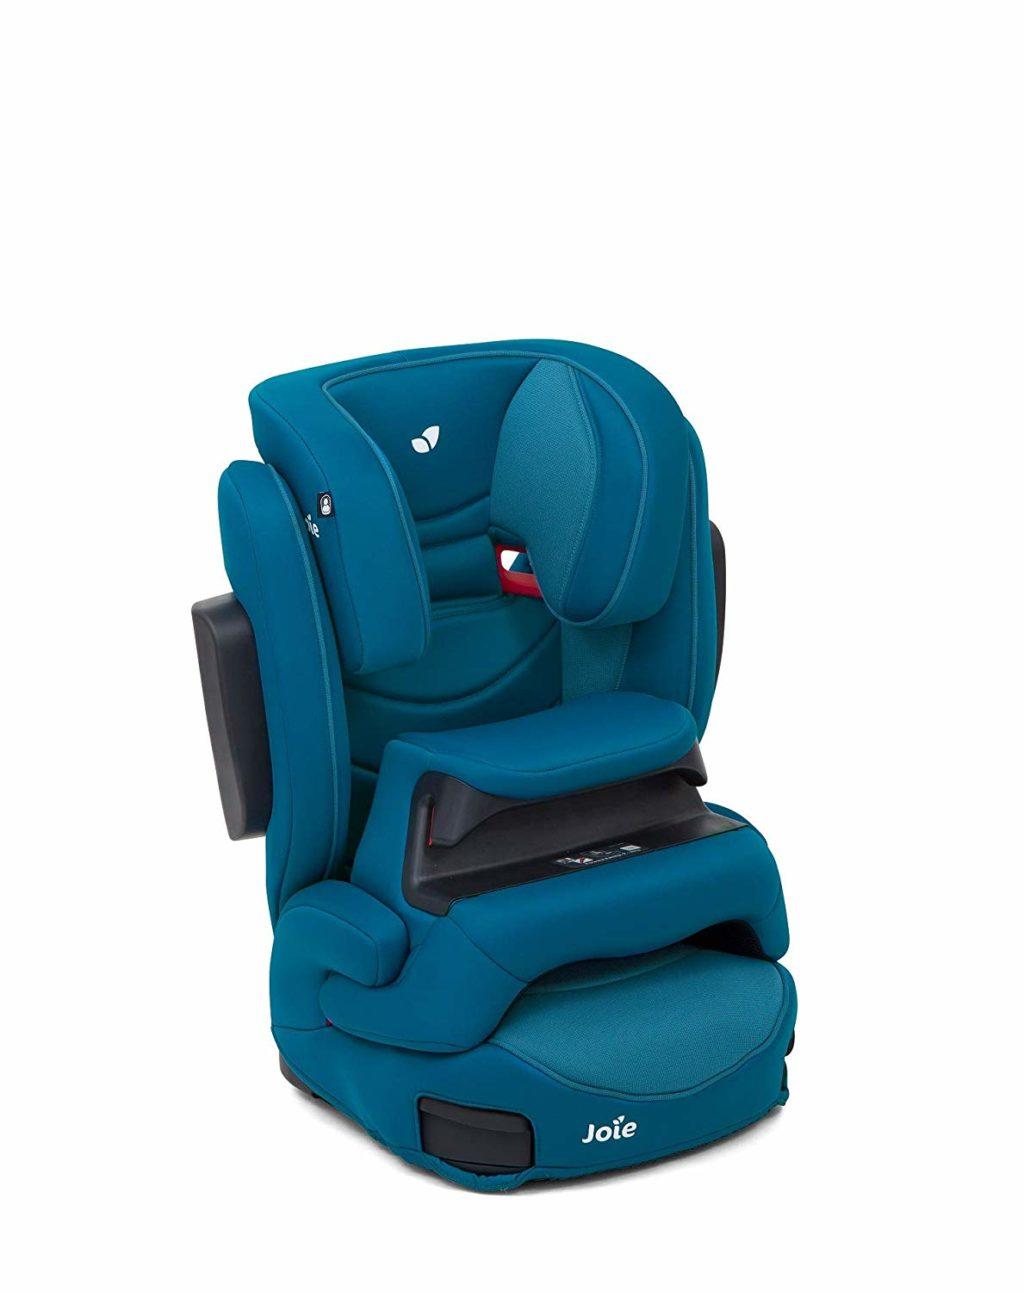 Joie Kindersitz blau Transcend